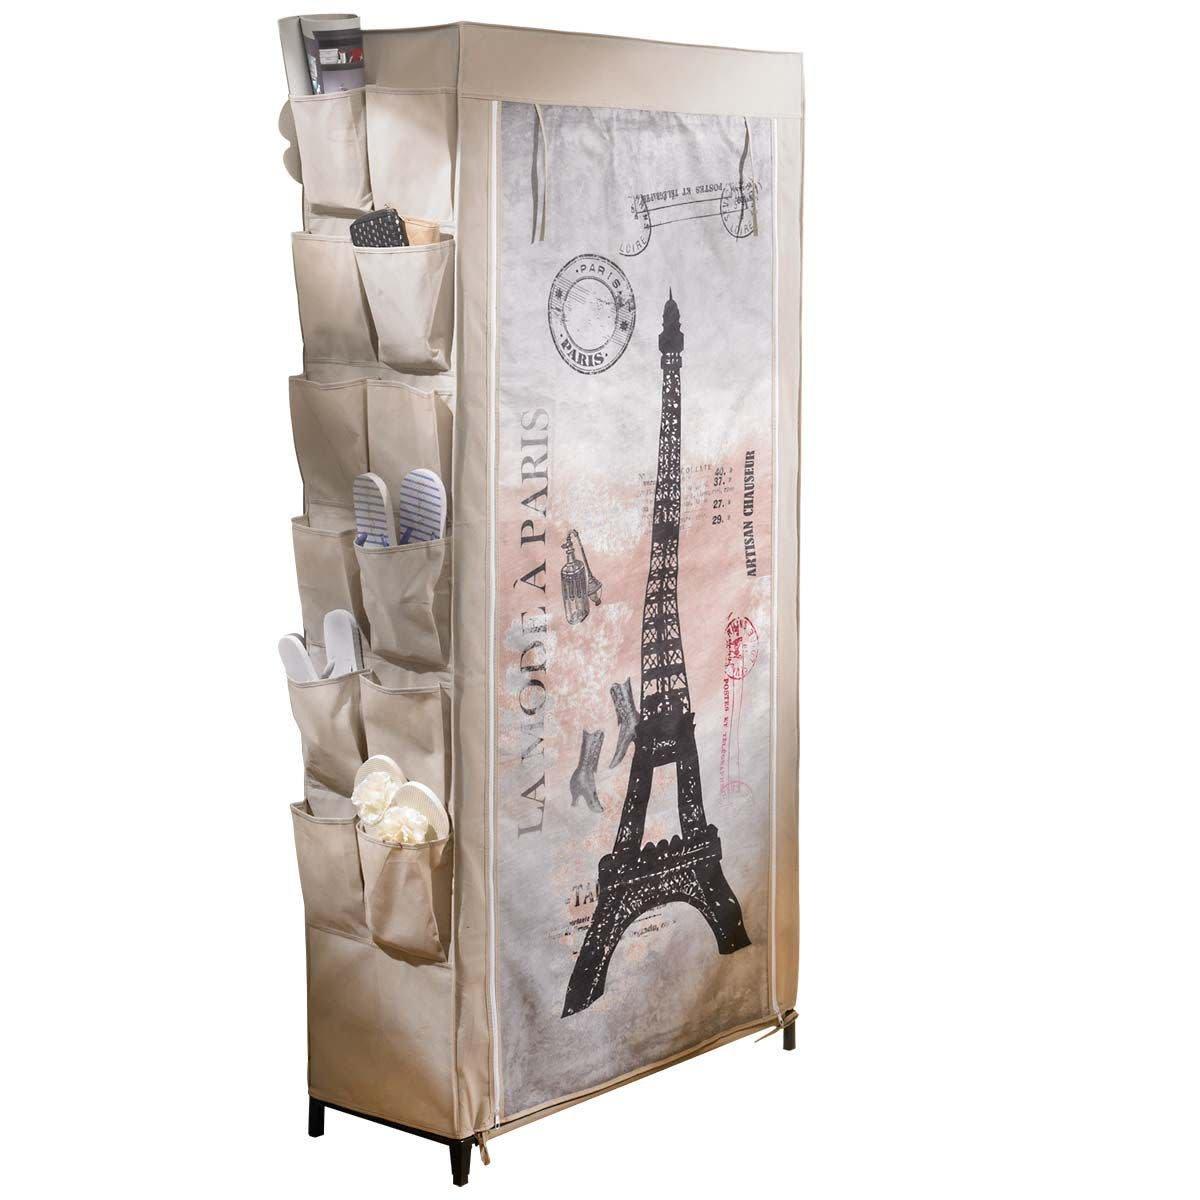 PuROTay Schuhregal Schuhschrank Paris Motiv ca. B80 x T30 x H170 cm Metallgestell Vlies-Verkleidung